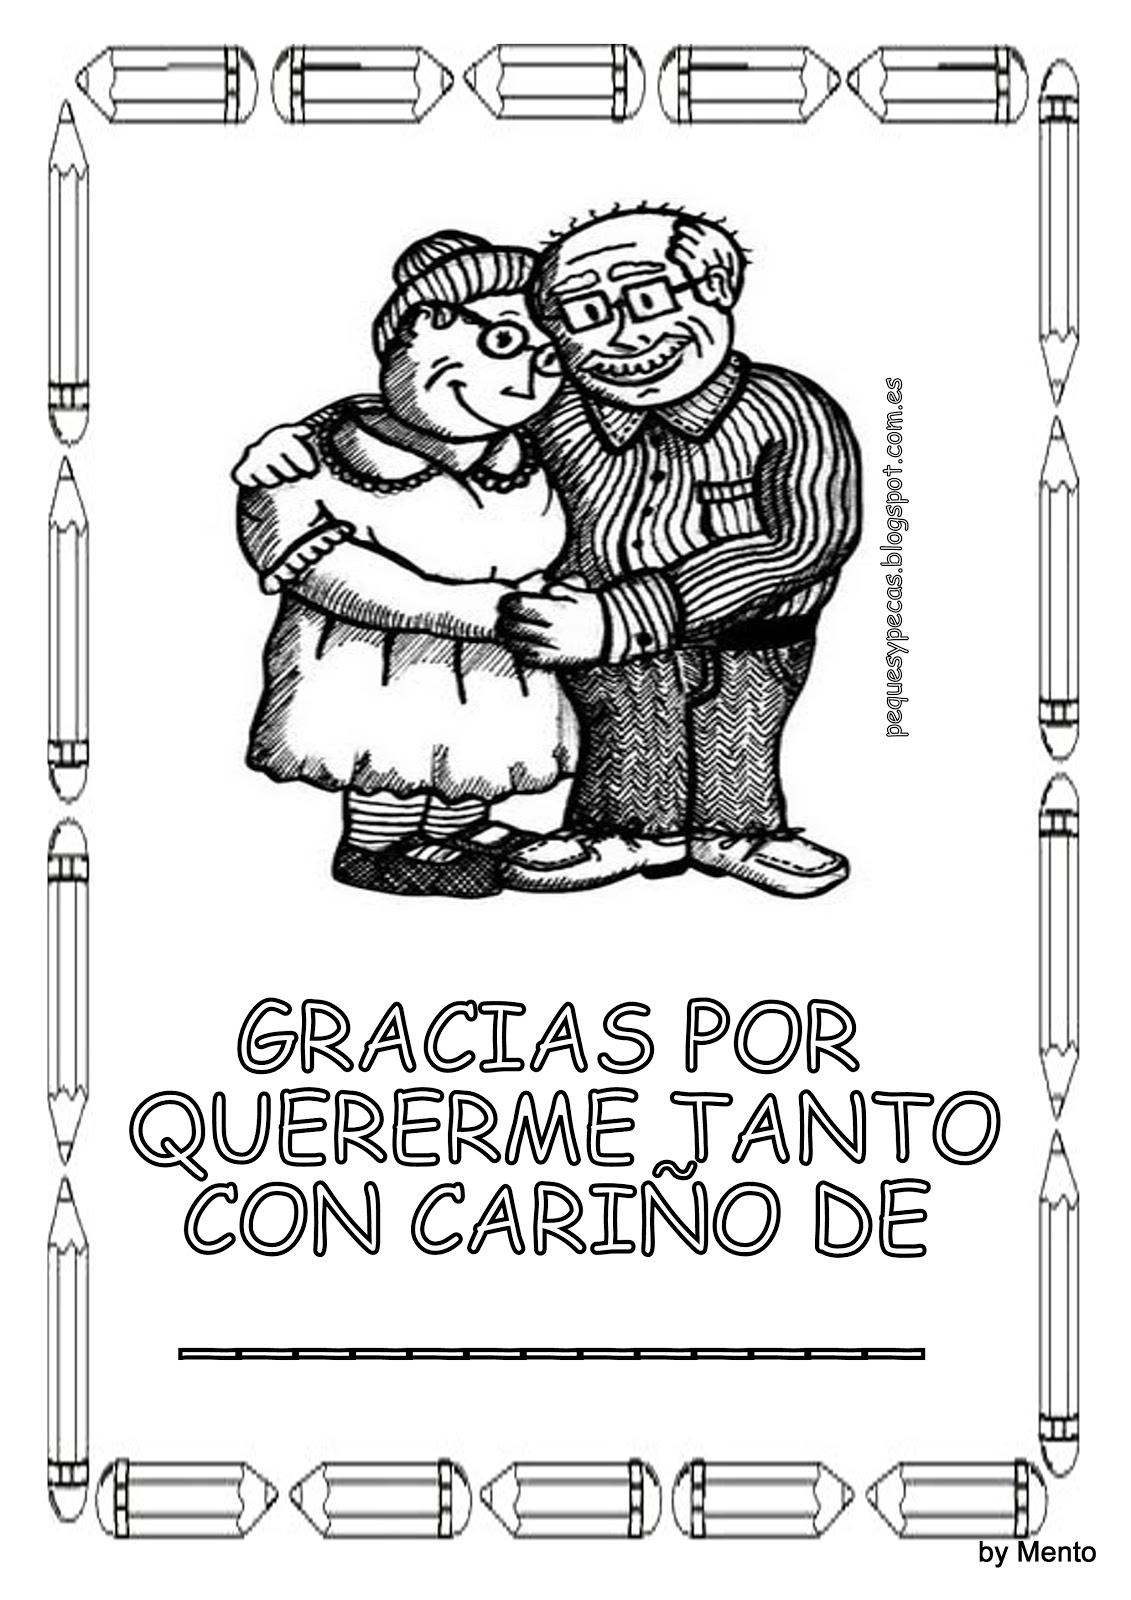 Postales para los abuelos - Didactalia: material educativo